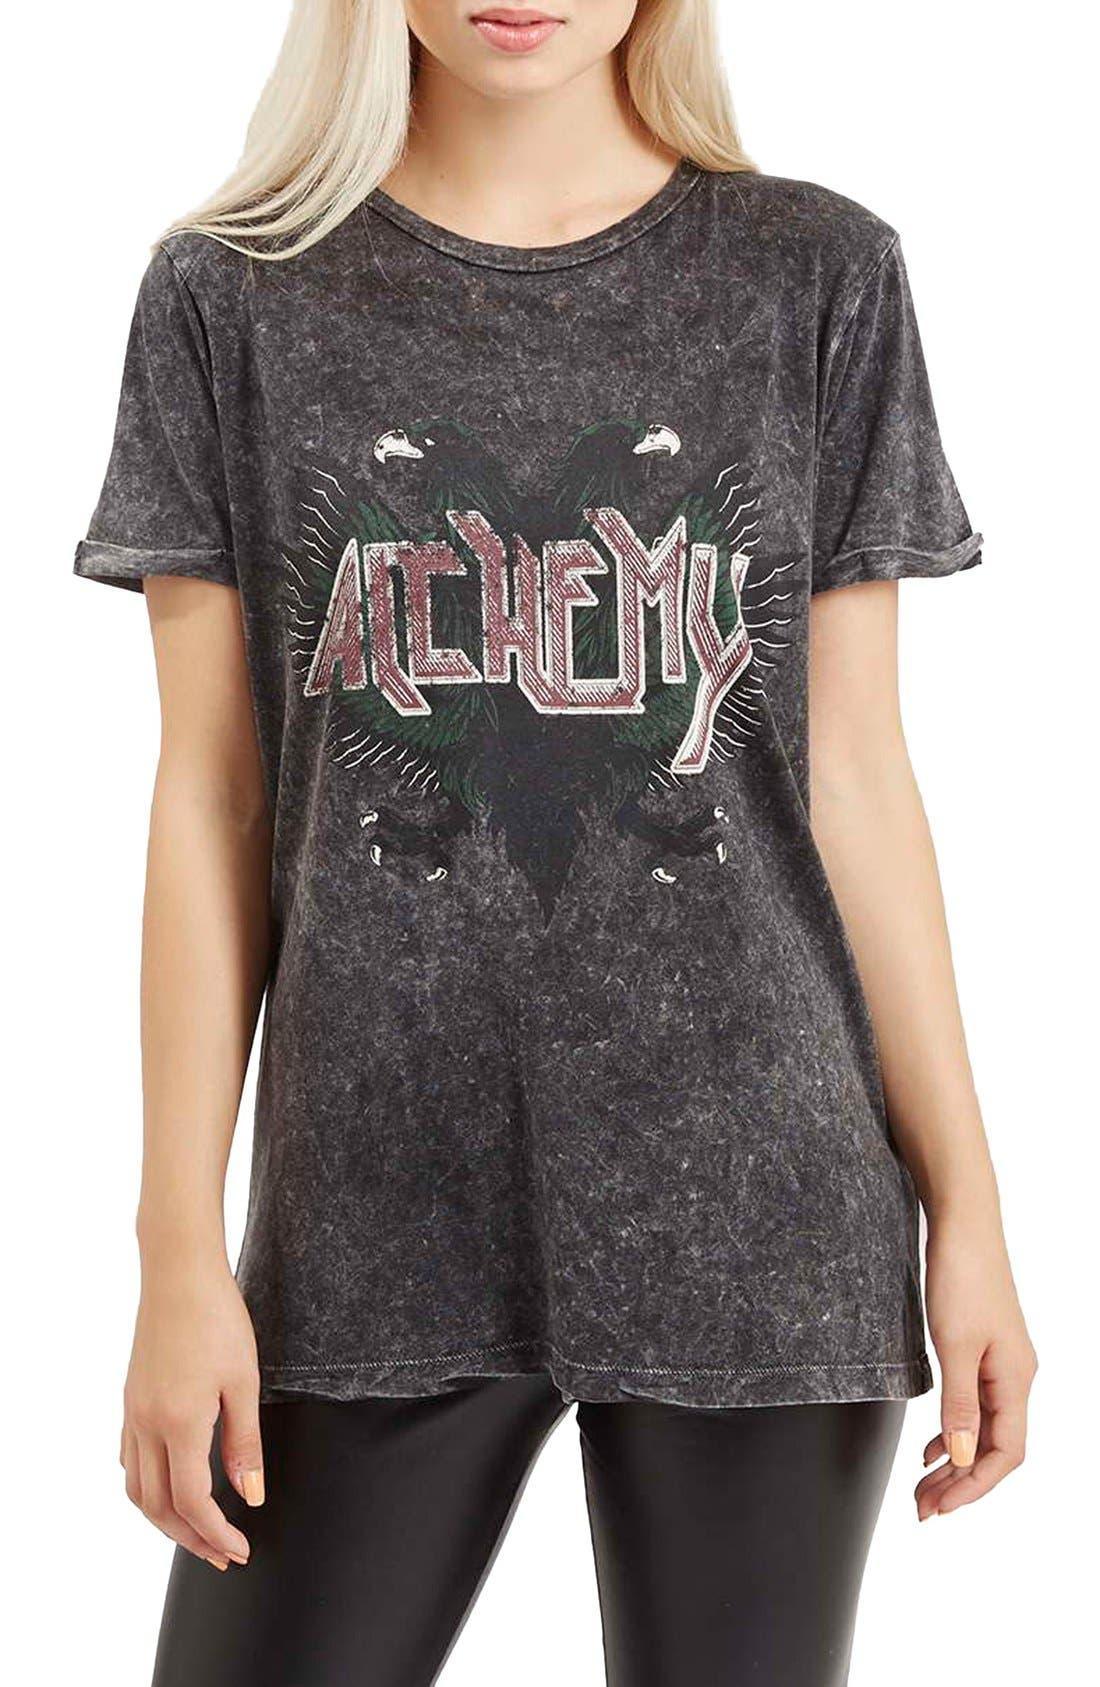 Alternate Image 1 Selected - Topshop 'Alchemy' Crewneck Rock Tee